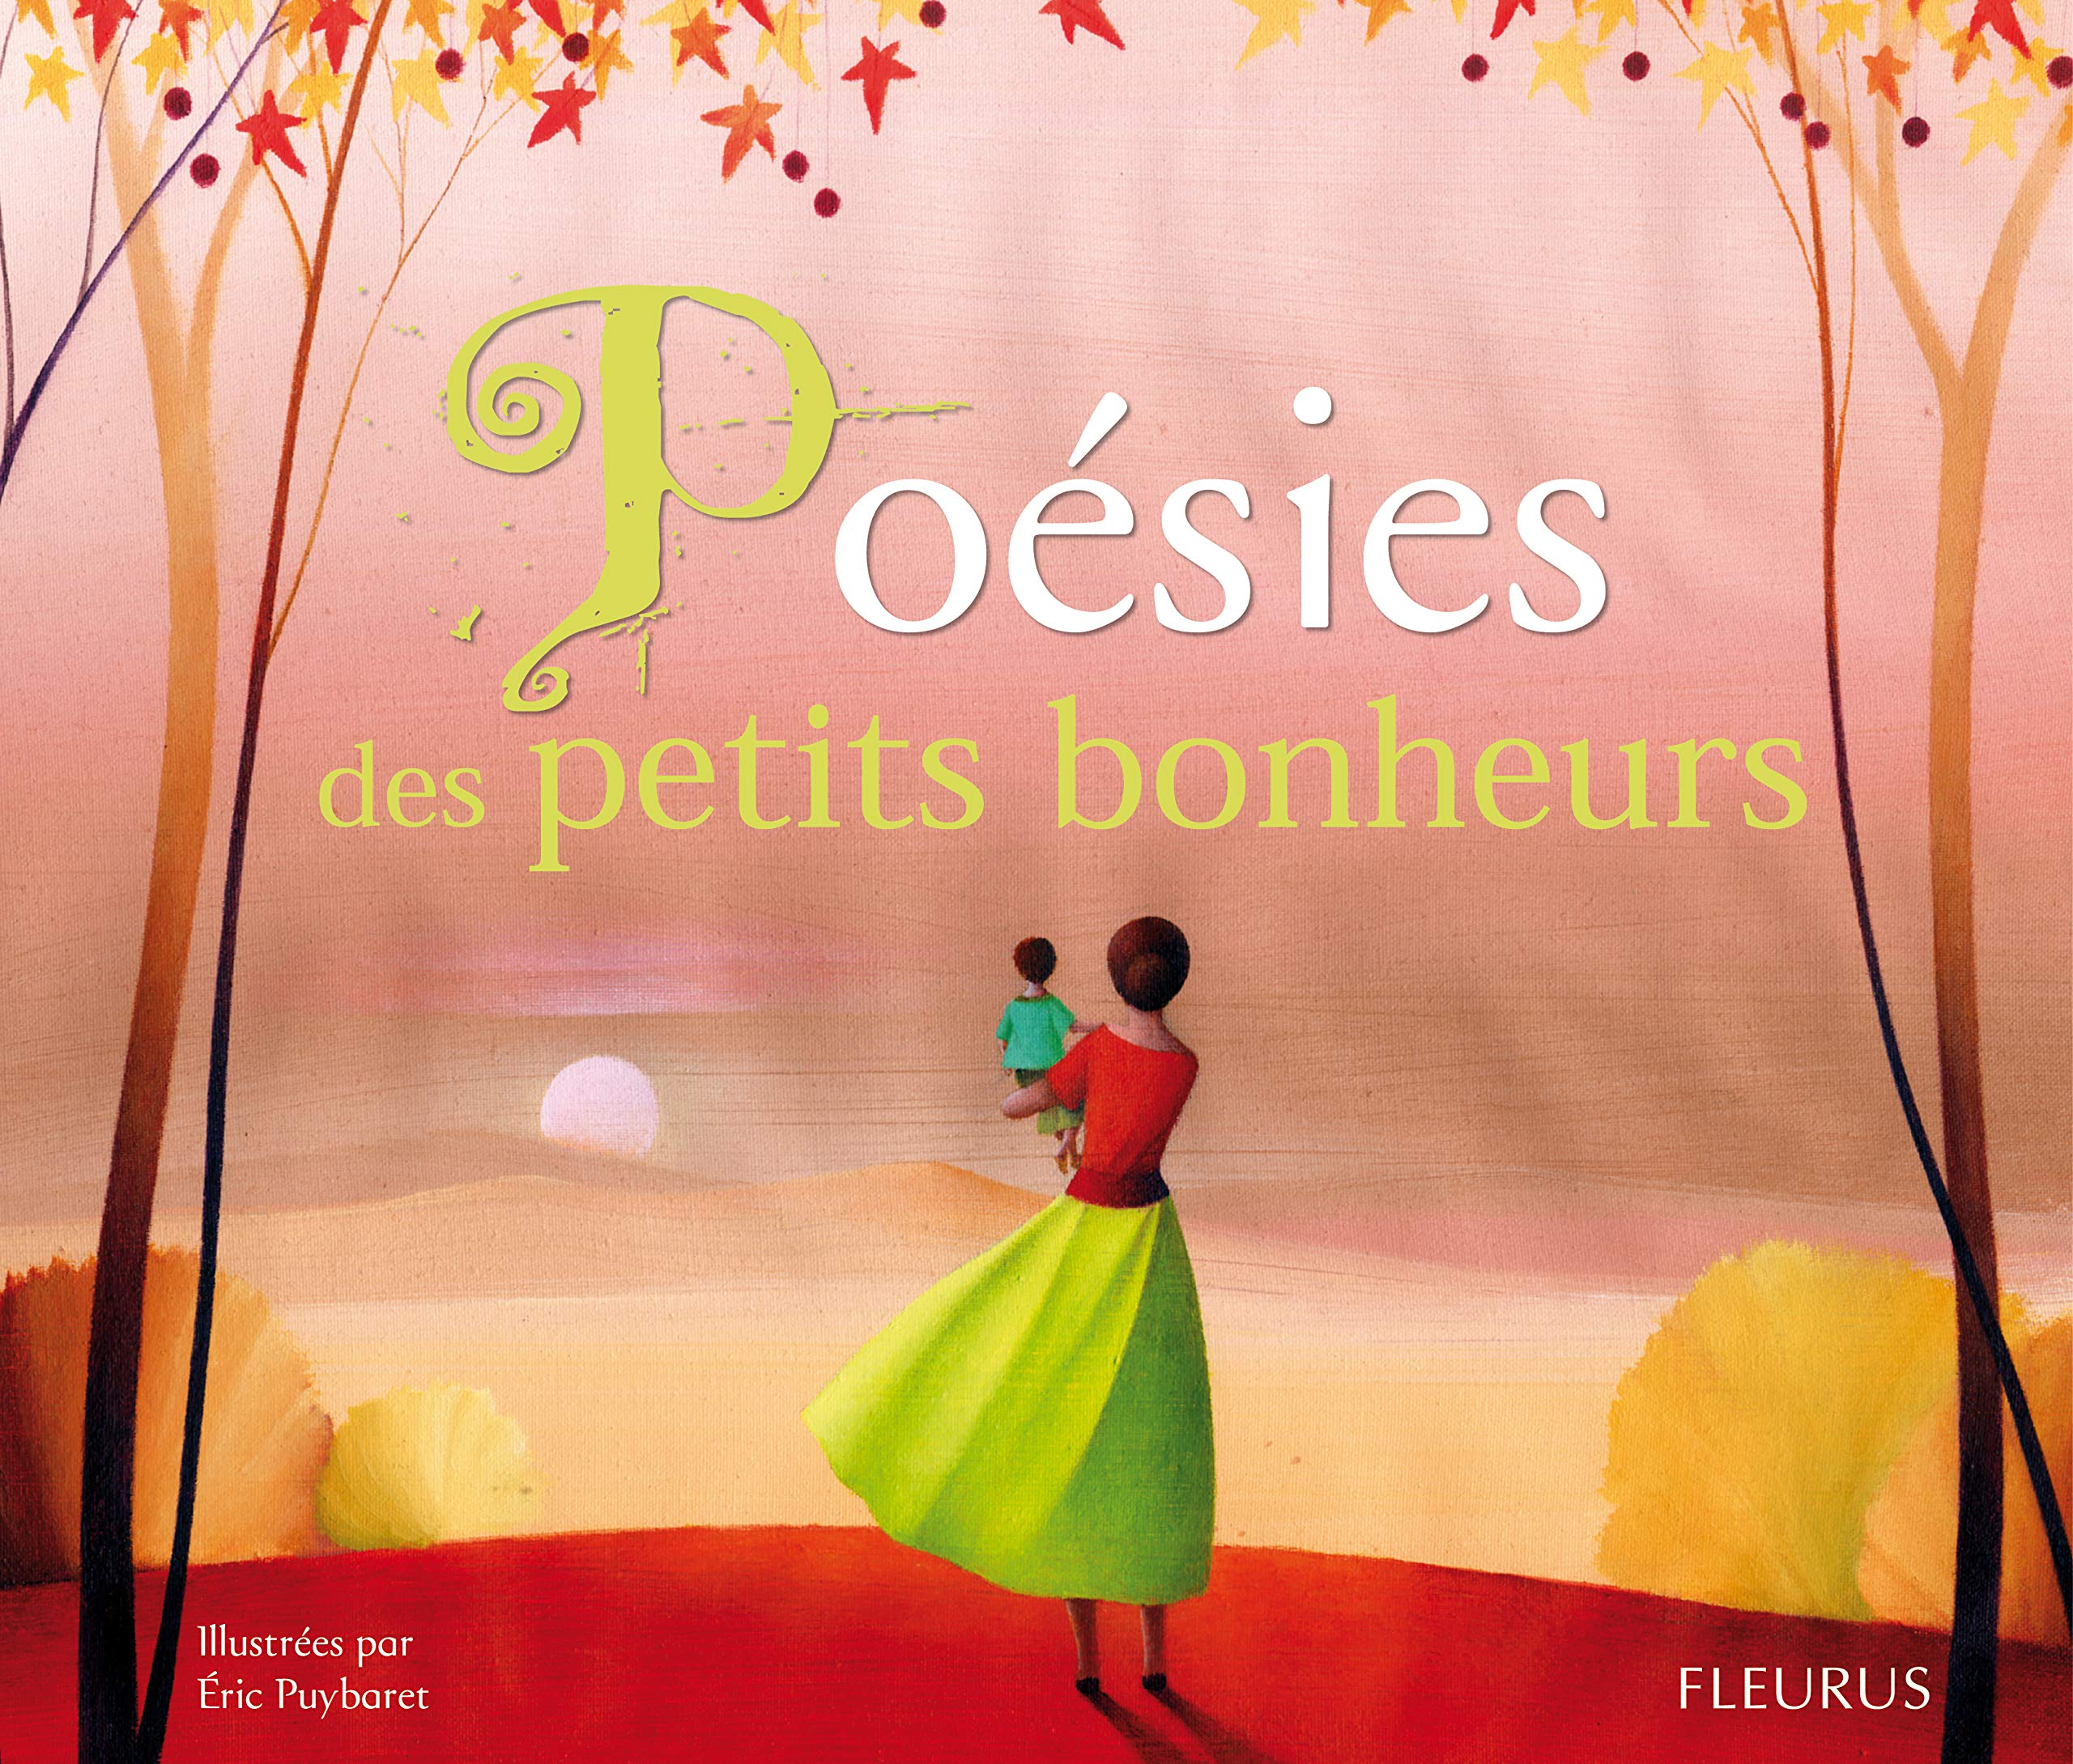 Poésies des petits bonheurs: Amazon.fr: Puybaret, Eric: Livres